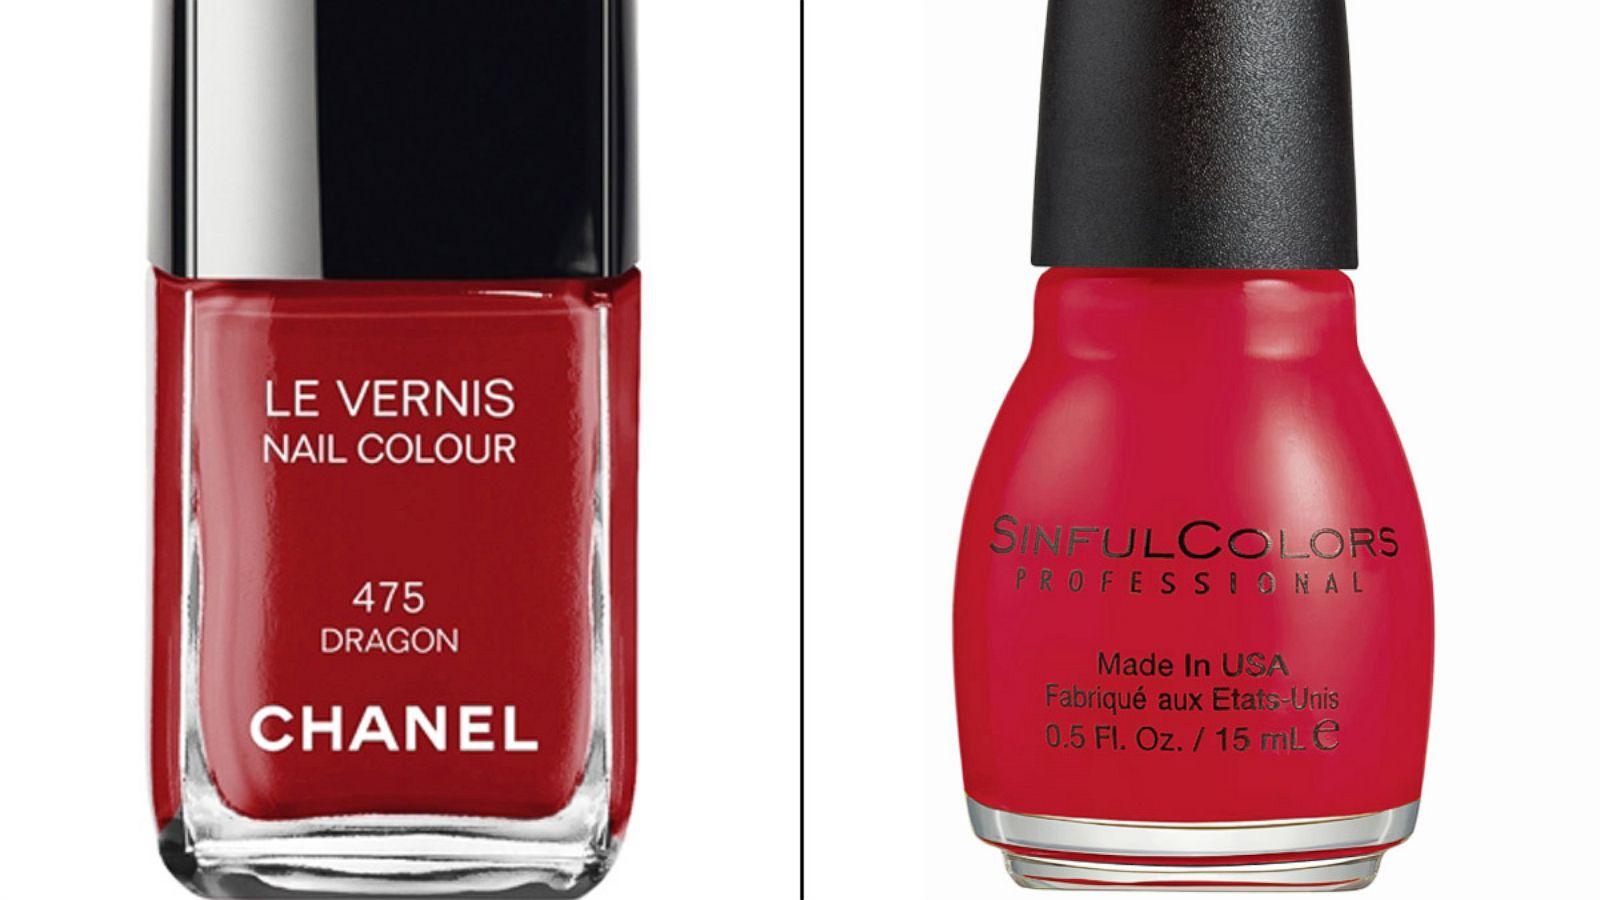 $2 Nail Polish Beats $27 Chanel Brand in Quality Test, Magazine Says ...